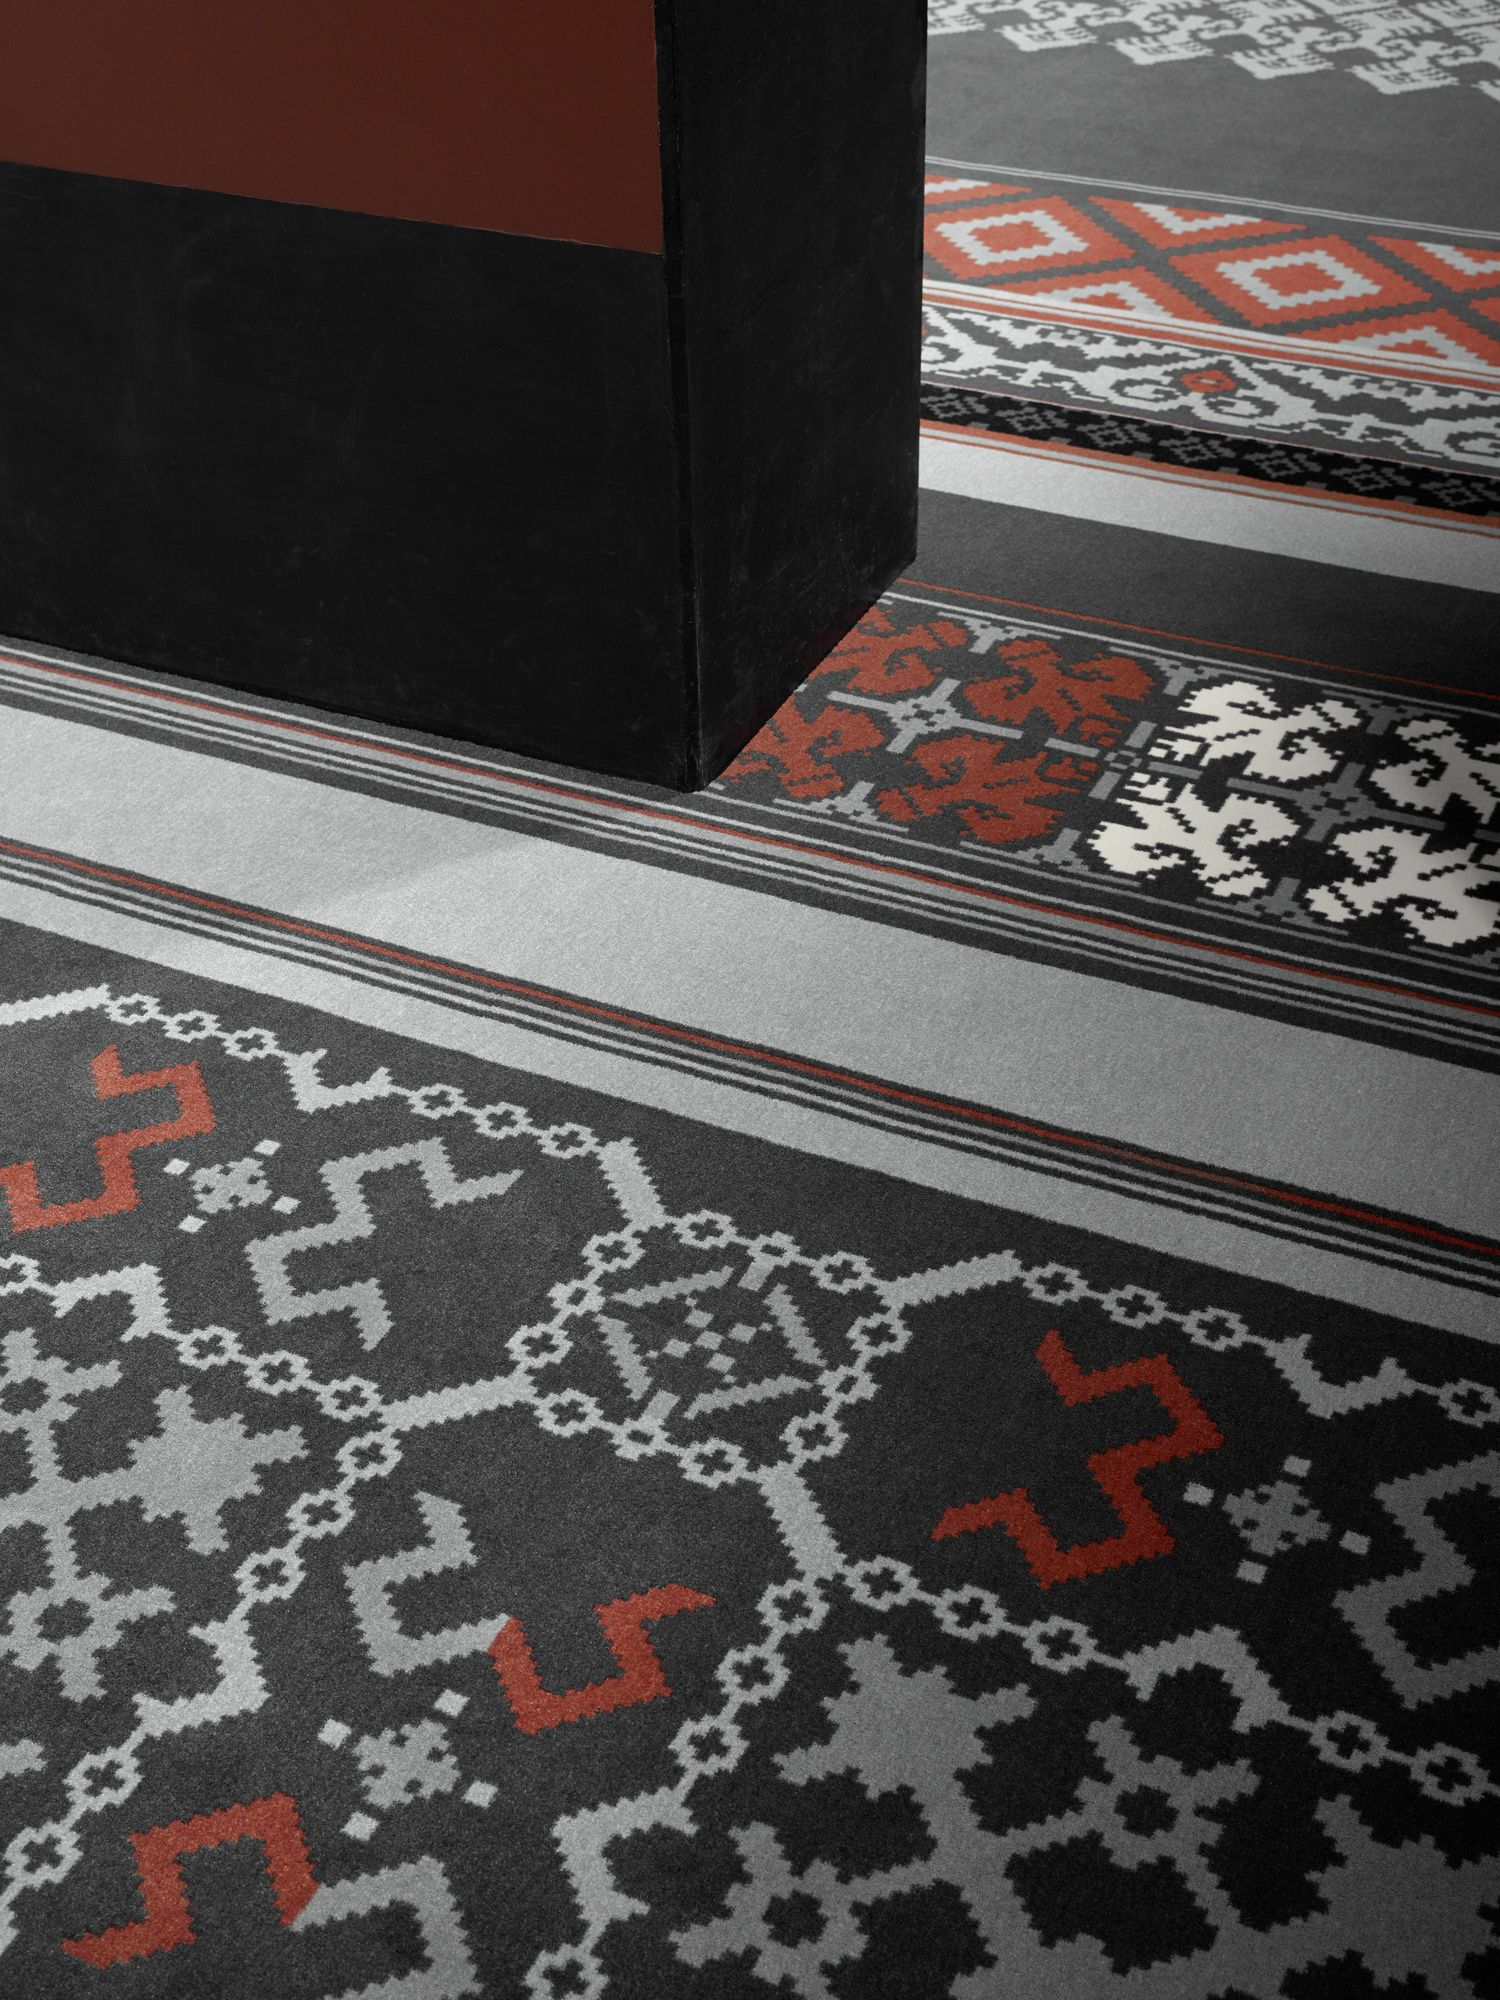 Village Prints Close Up Cultures Collection By Egecarpets Colourful Pattern Carpets Interiordesign Carpet Design Flooring Projects Carpet